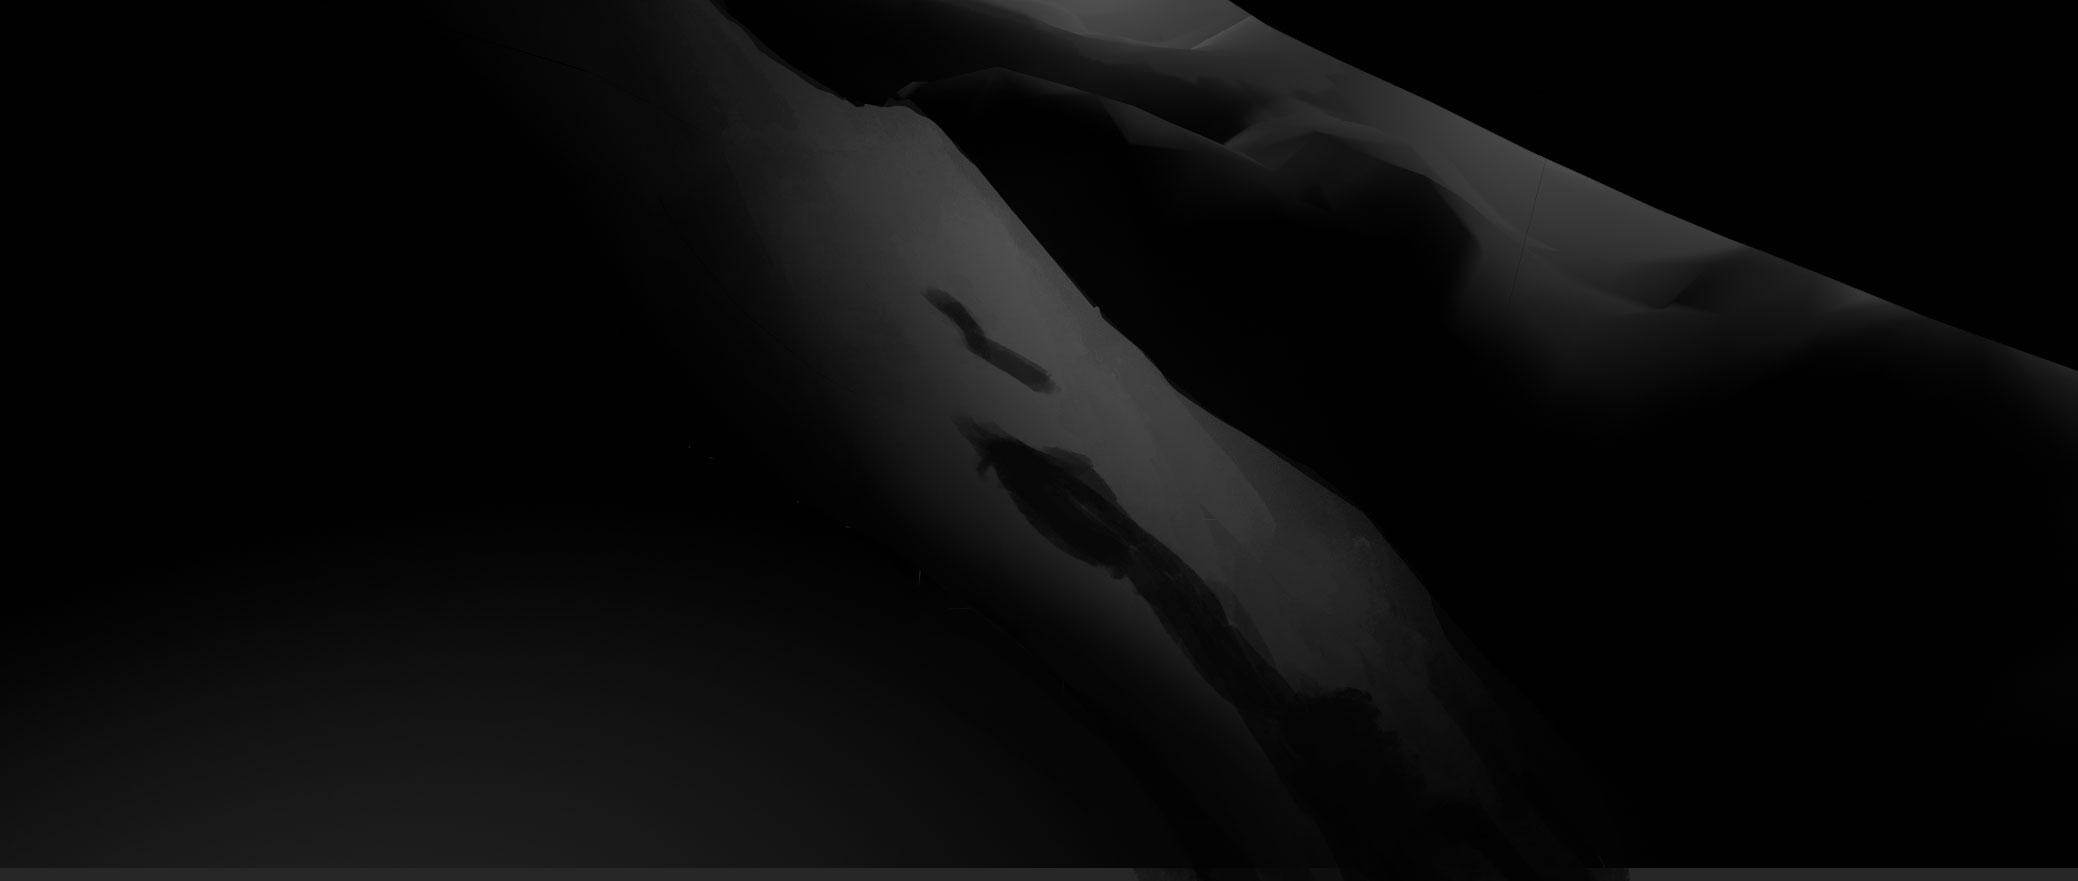 Wraiths_2019Animatic_Thumbsheet-02_79.jpg